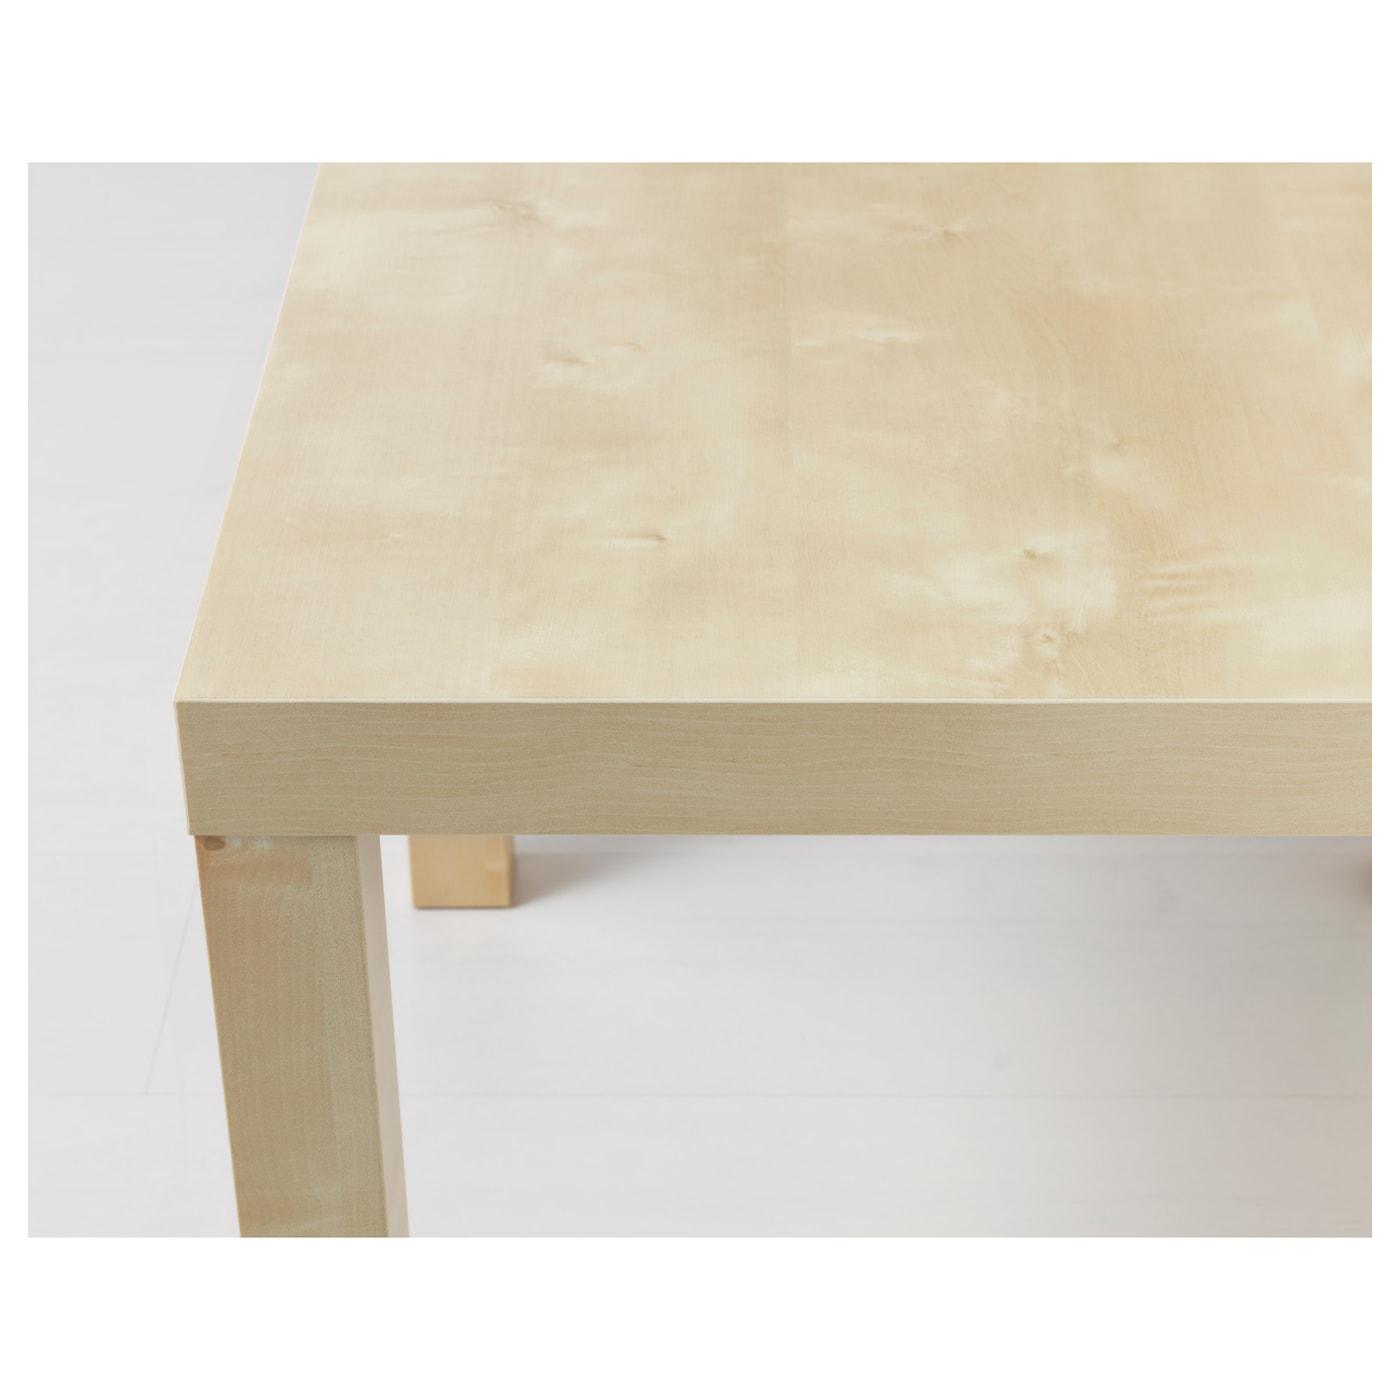 lack side table birch effect 55 x 55 cm ikea. Black Bedroom Furniture Sets. Home Design Ideas